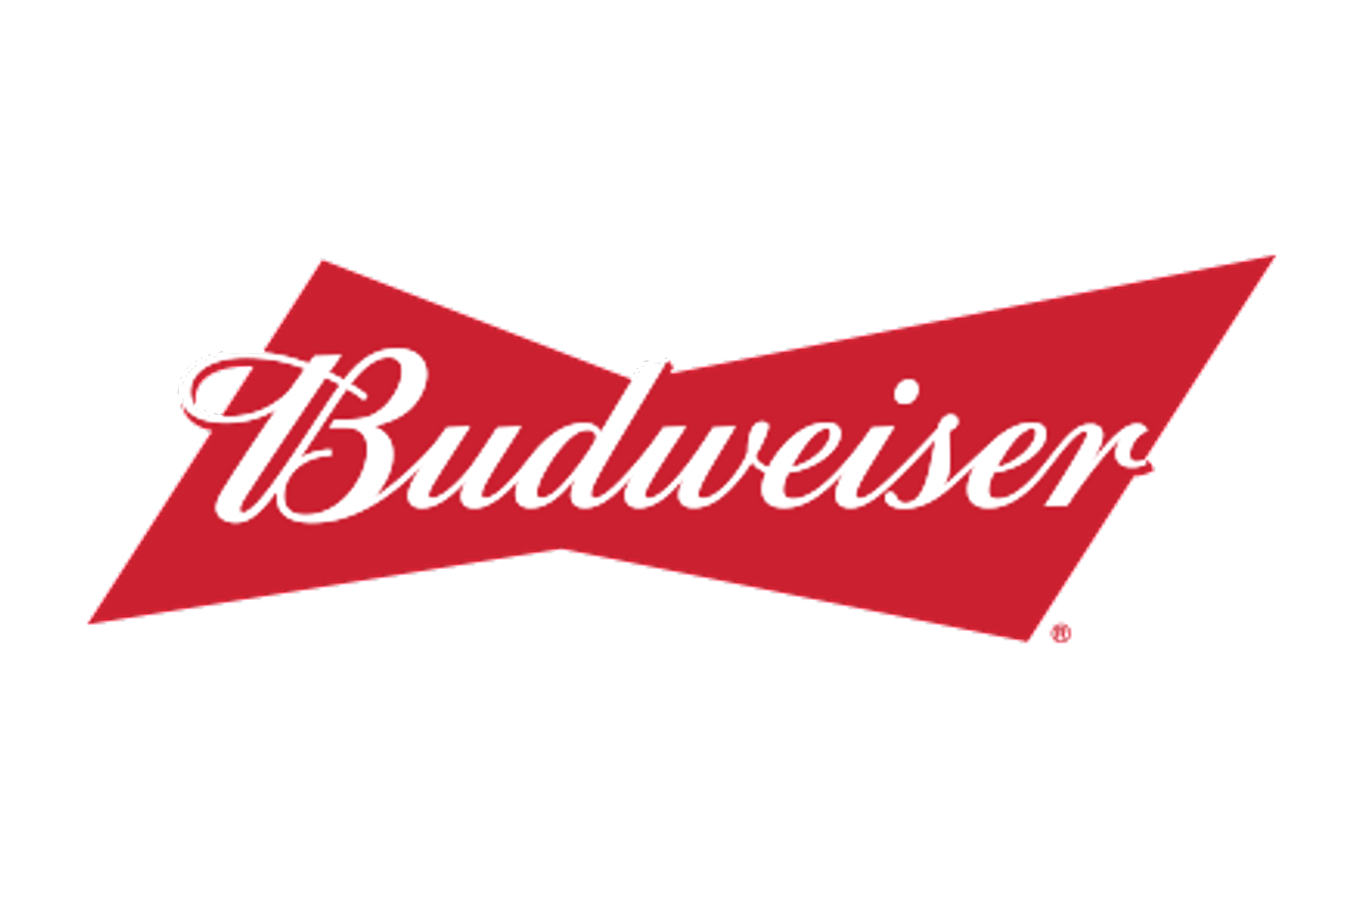 BudwesierLogo